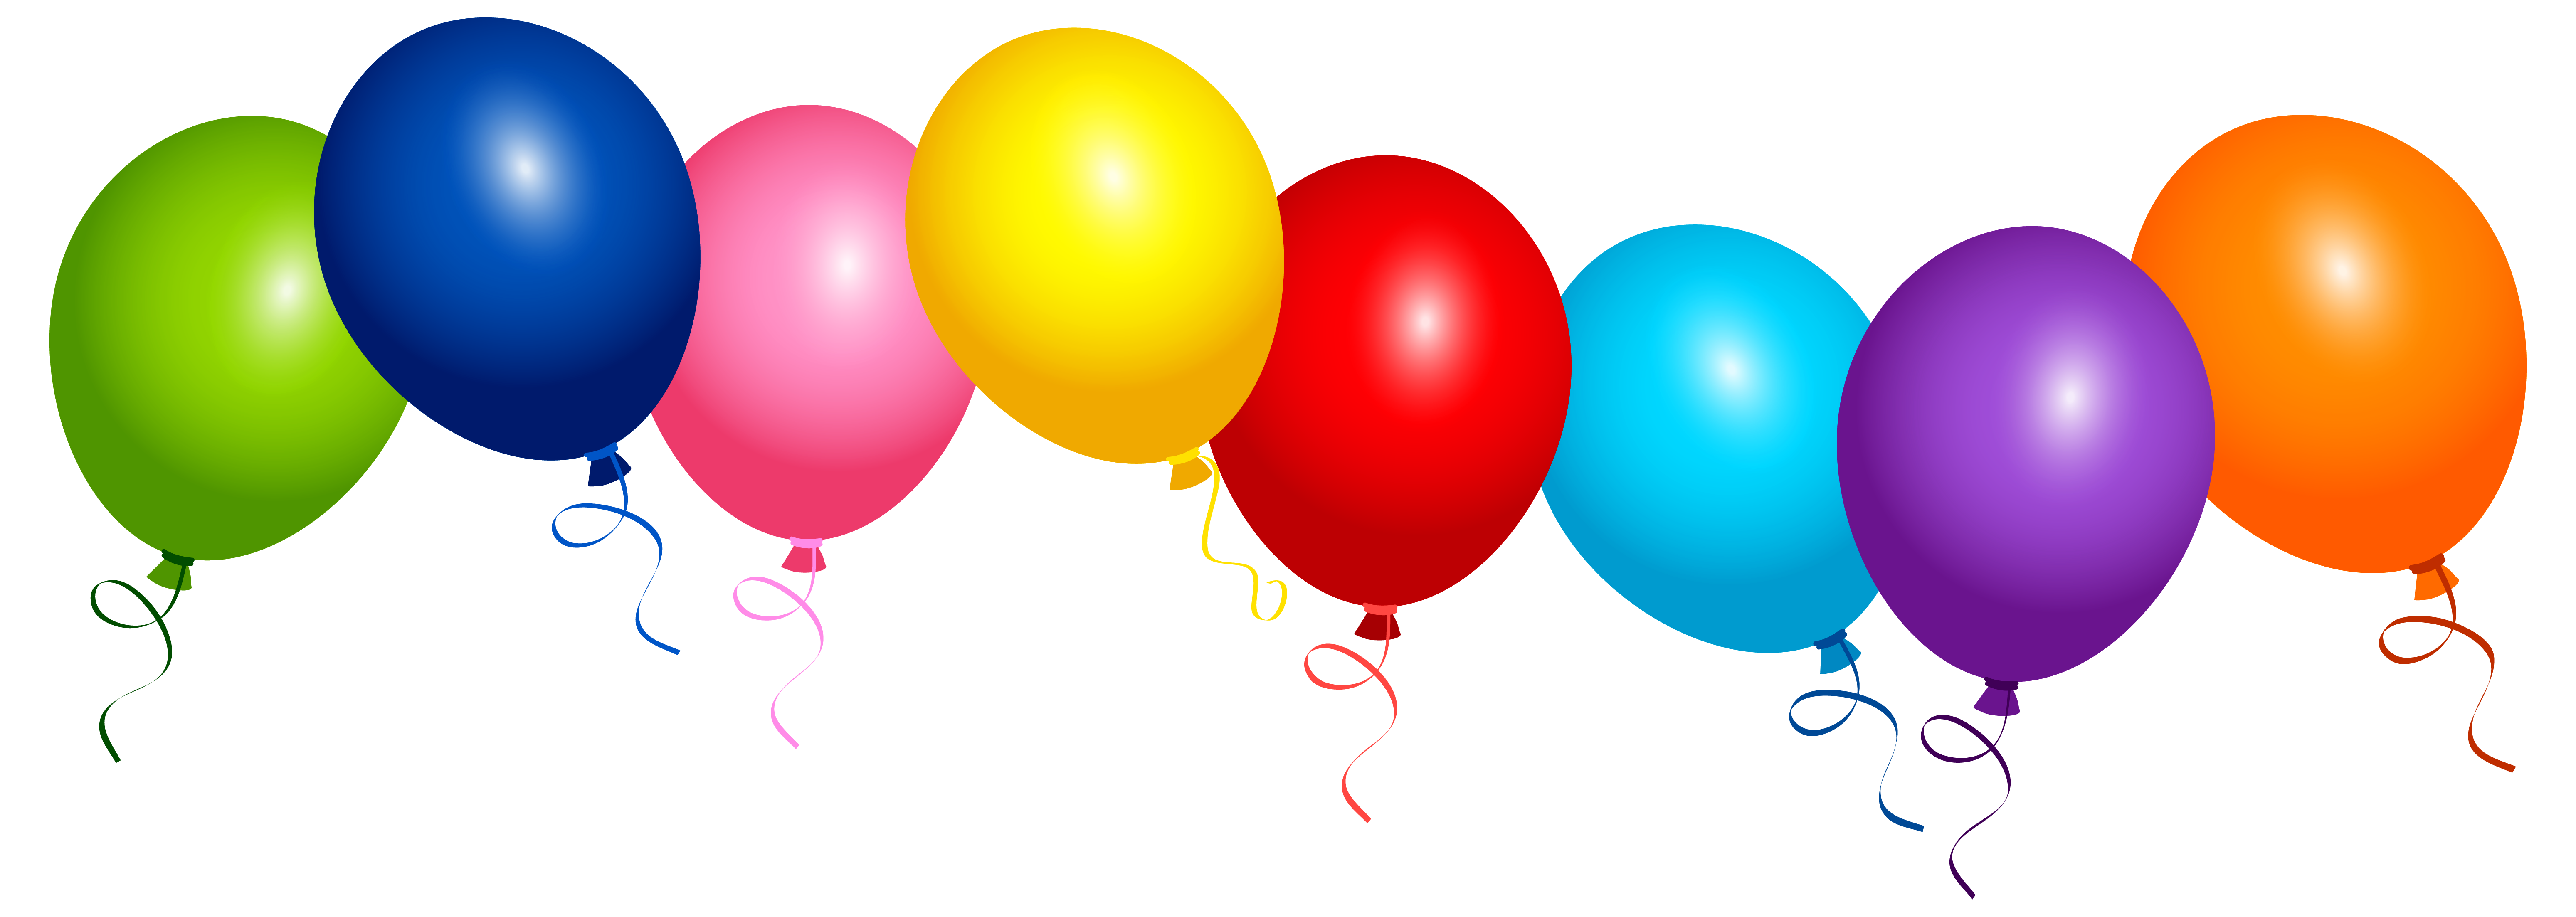 Free jokingart com printable. Clipart clouds balloon